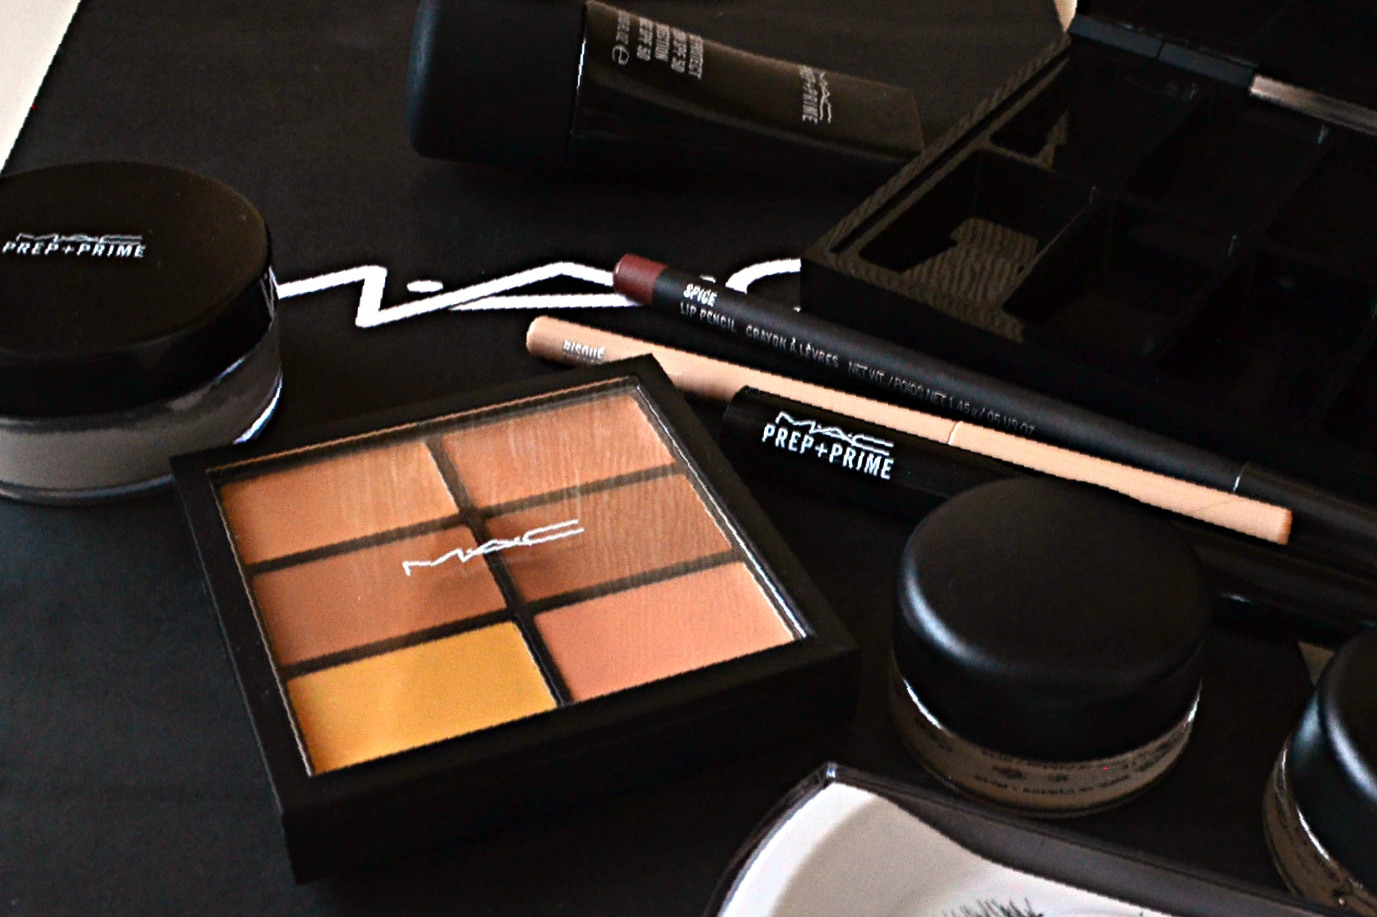 MAC student makeup kit | Beauty by Krista